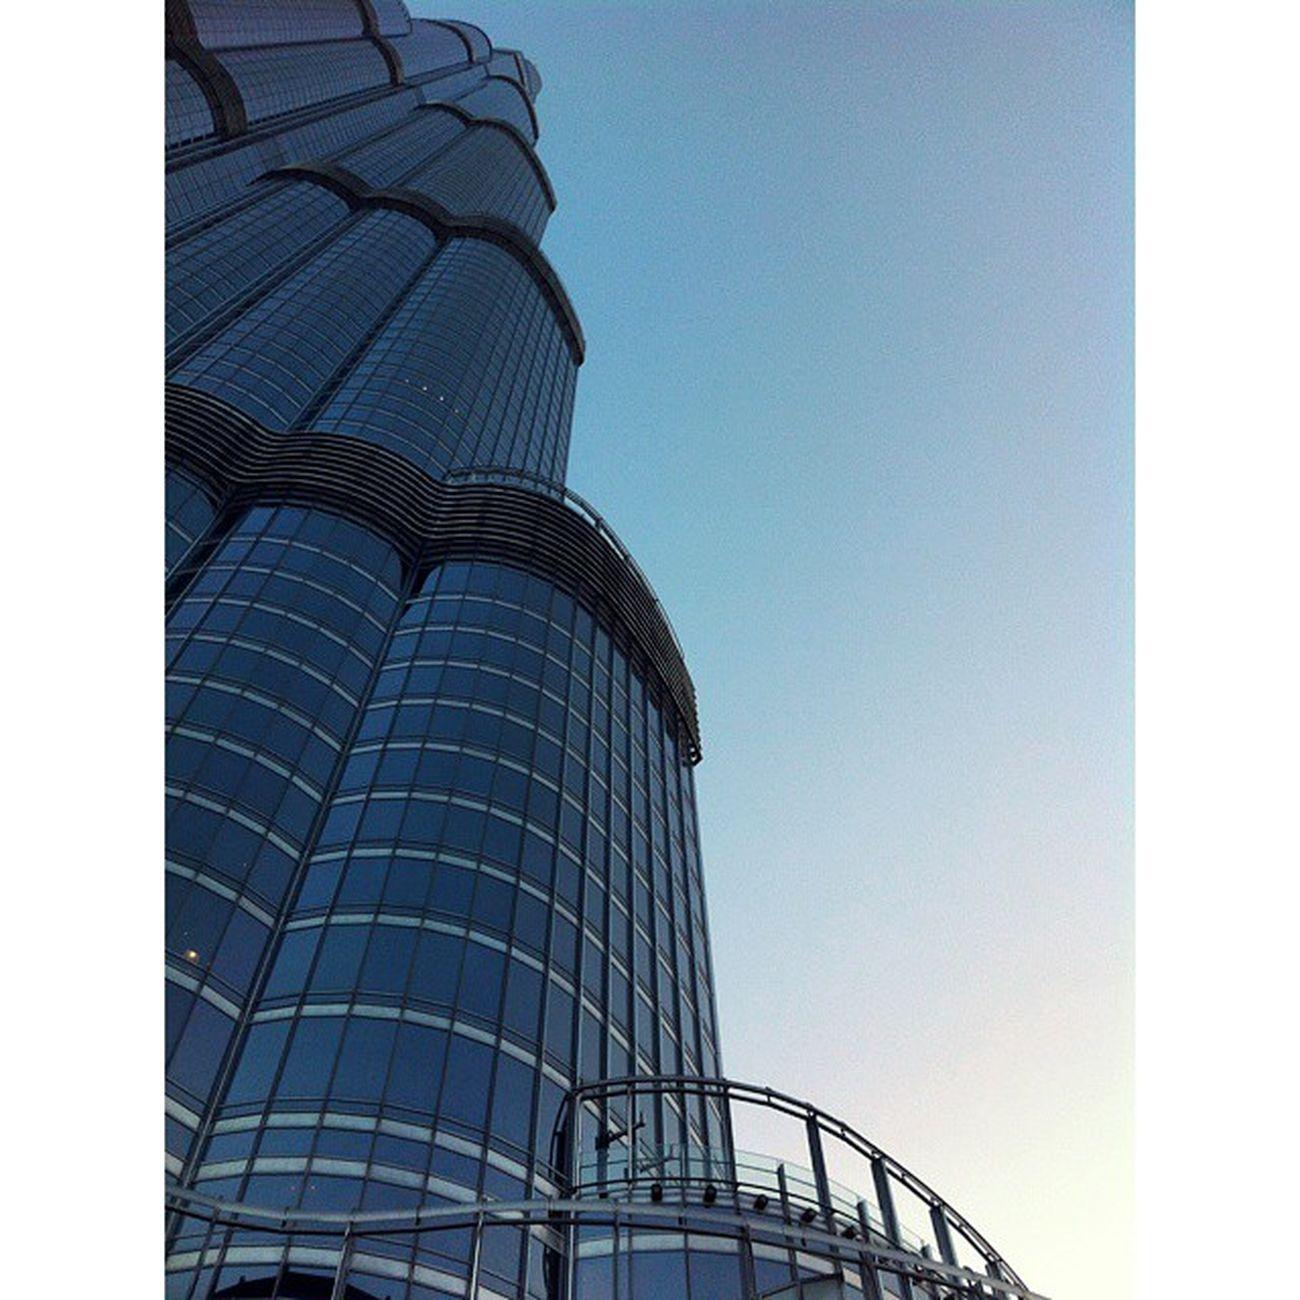 Greatest architecture I've ever witness in my entire life! The most elegant looking skyscraper, Burj Khalifa. Dubai Throwback Breathtaking View burjkhalifa skyscraper architecture scenery lastyear uae emirates